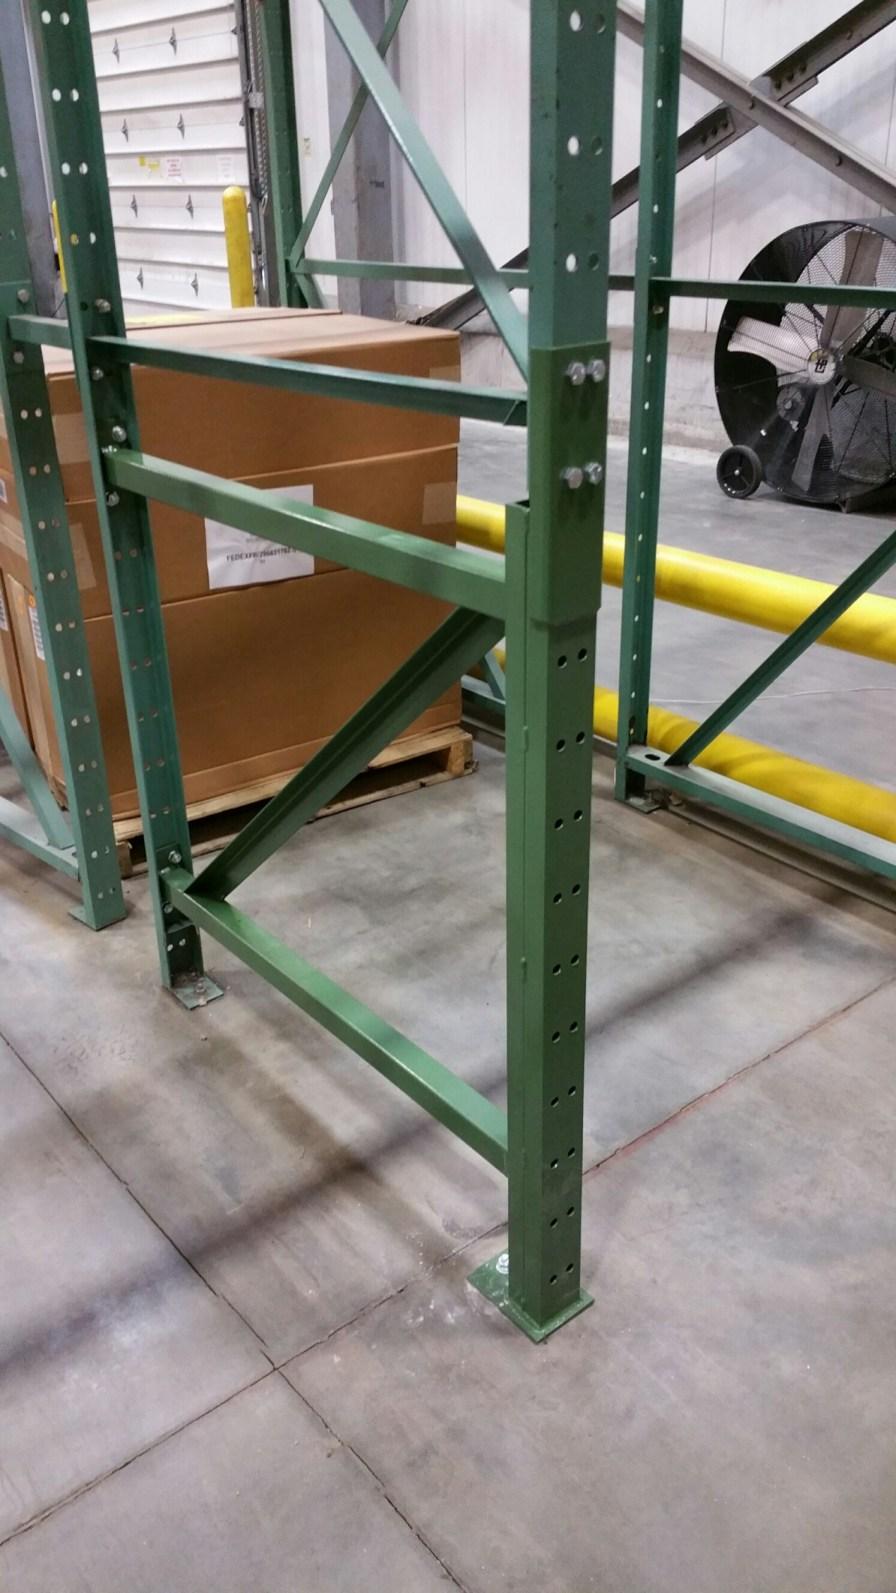 Upright Frame Repair Kit